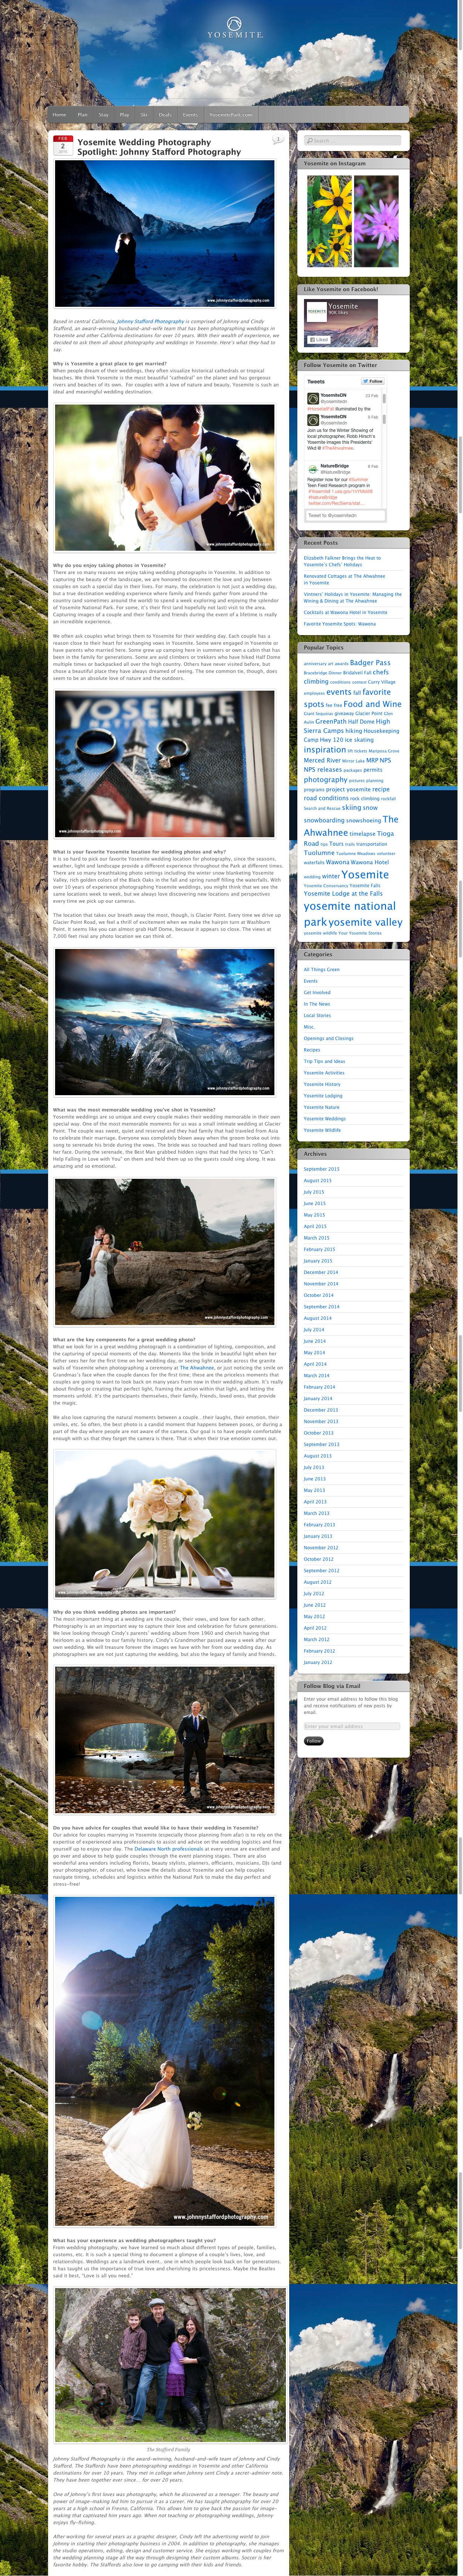 Yosemite_blog_article